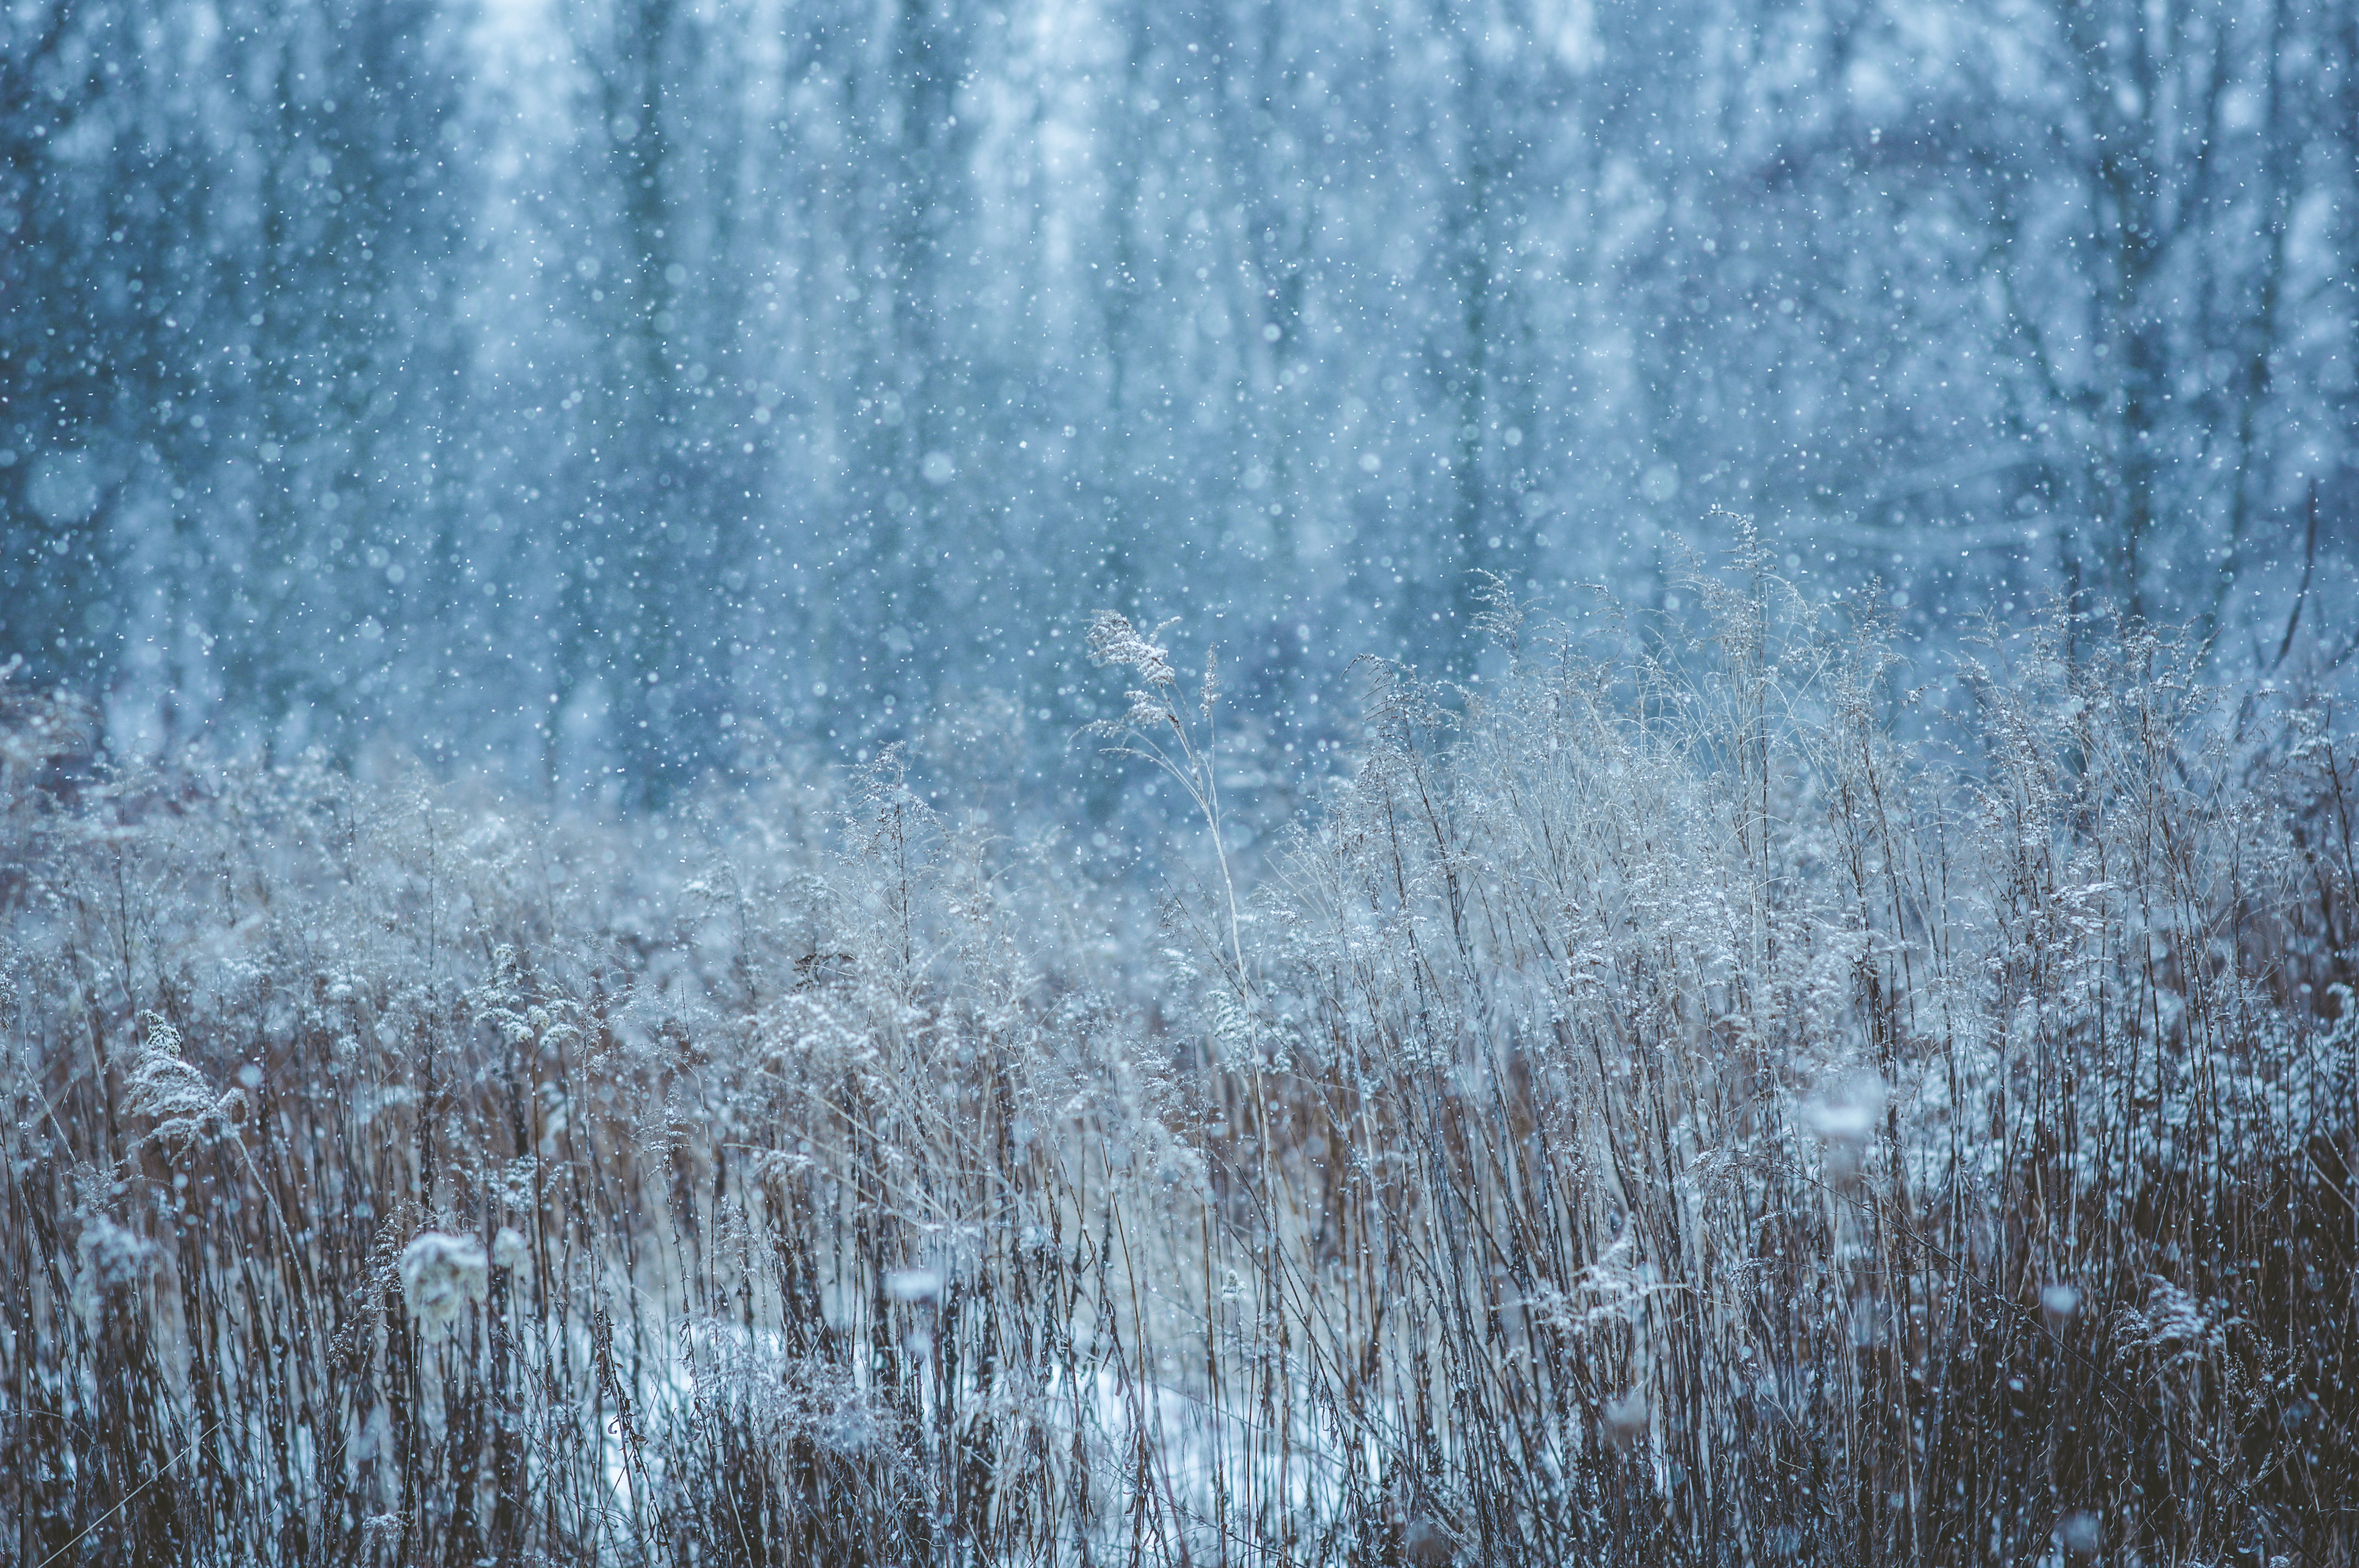 winter snow field 1574939439 - Winter Snow Field -